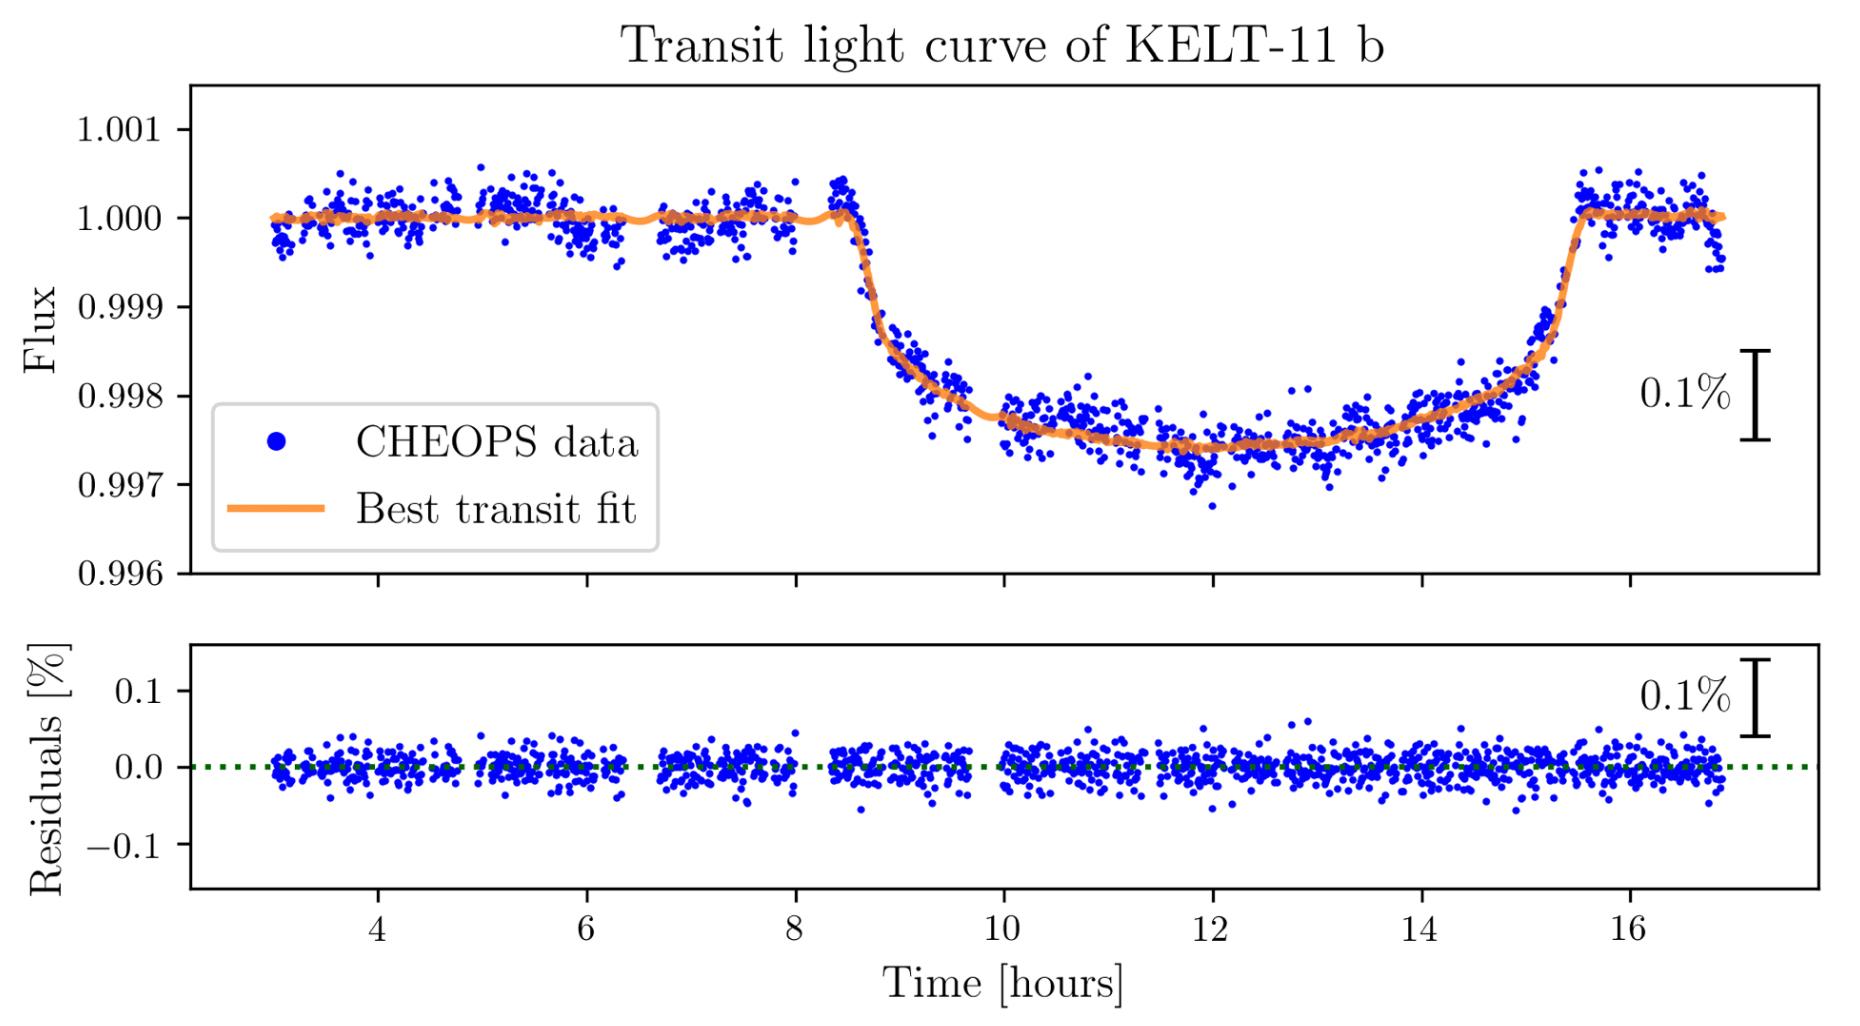 ESA_CHEOPS_Light_Curve_KELT-11b.jpg